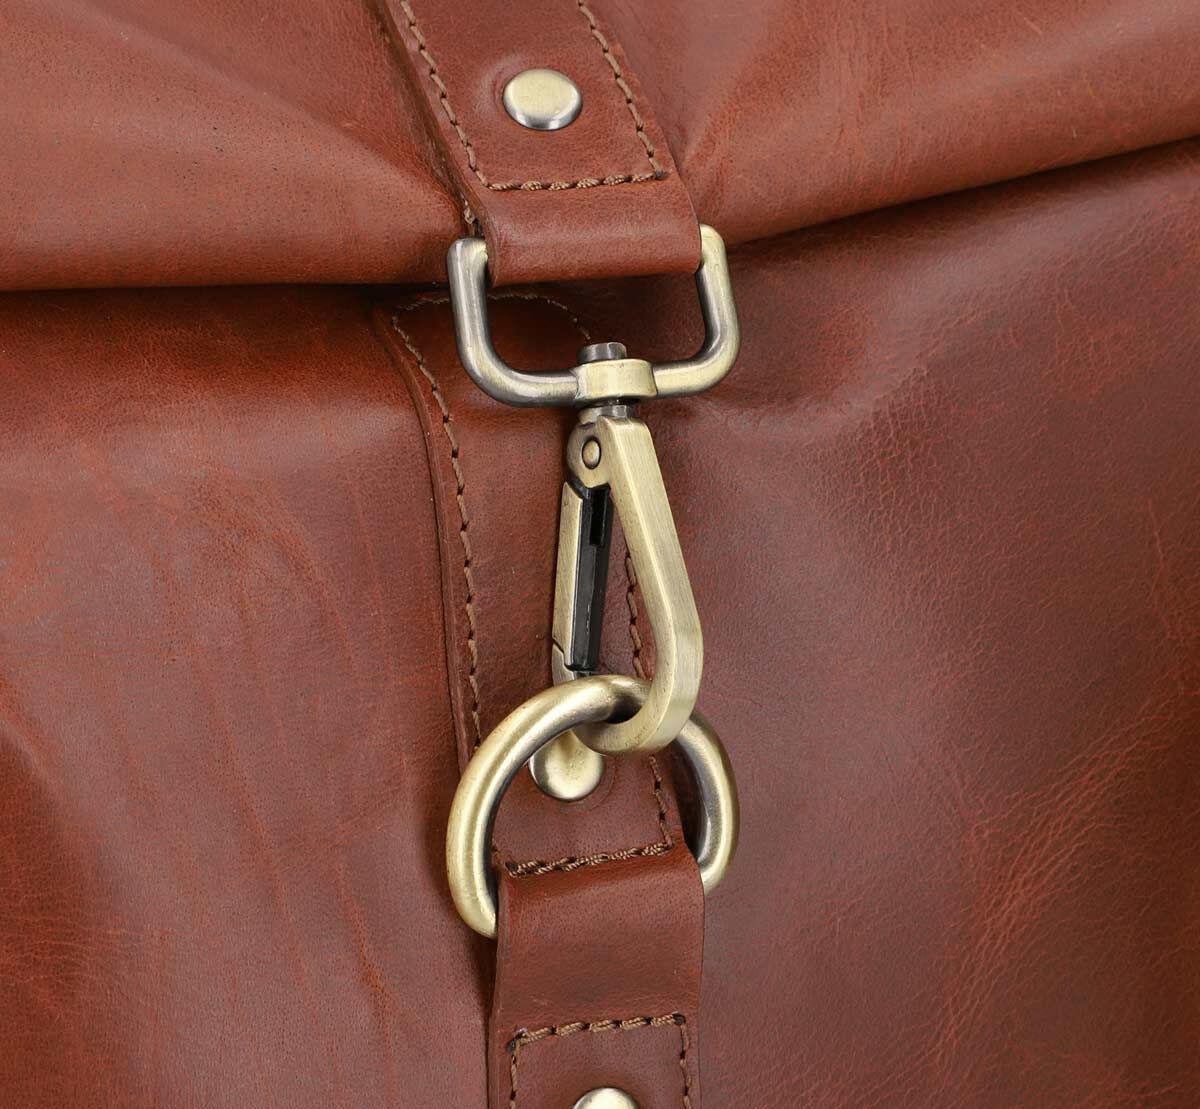 Outlet Rucksack – faltiges Leder – kleinere Lederfehler – ansonsten neu – Siehe Video